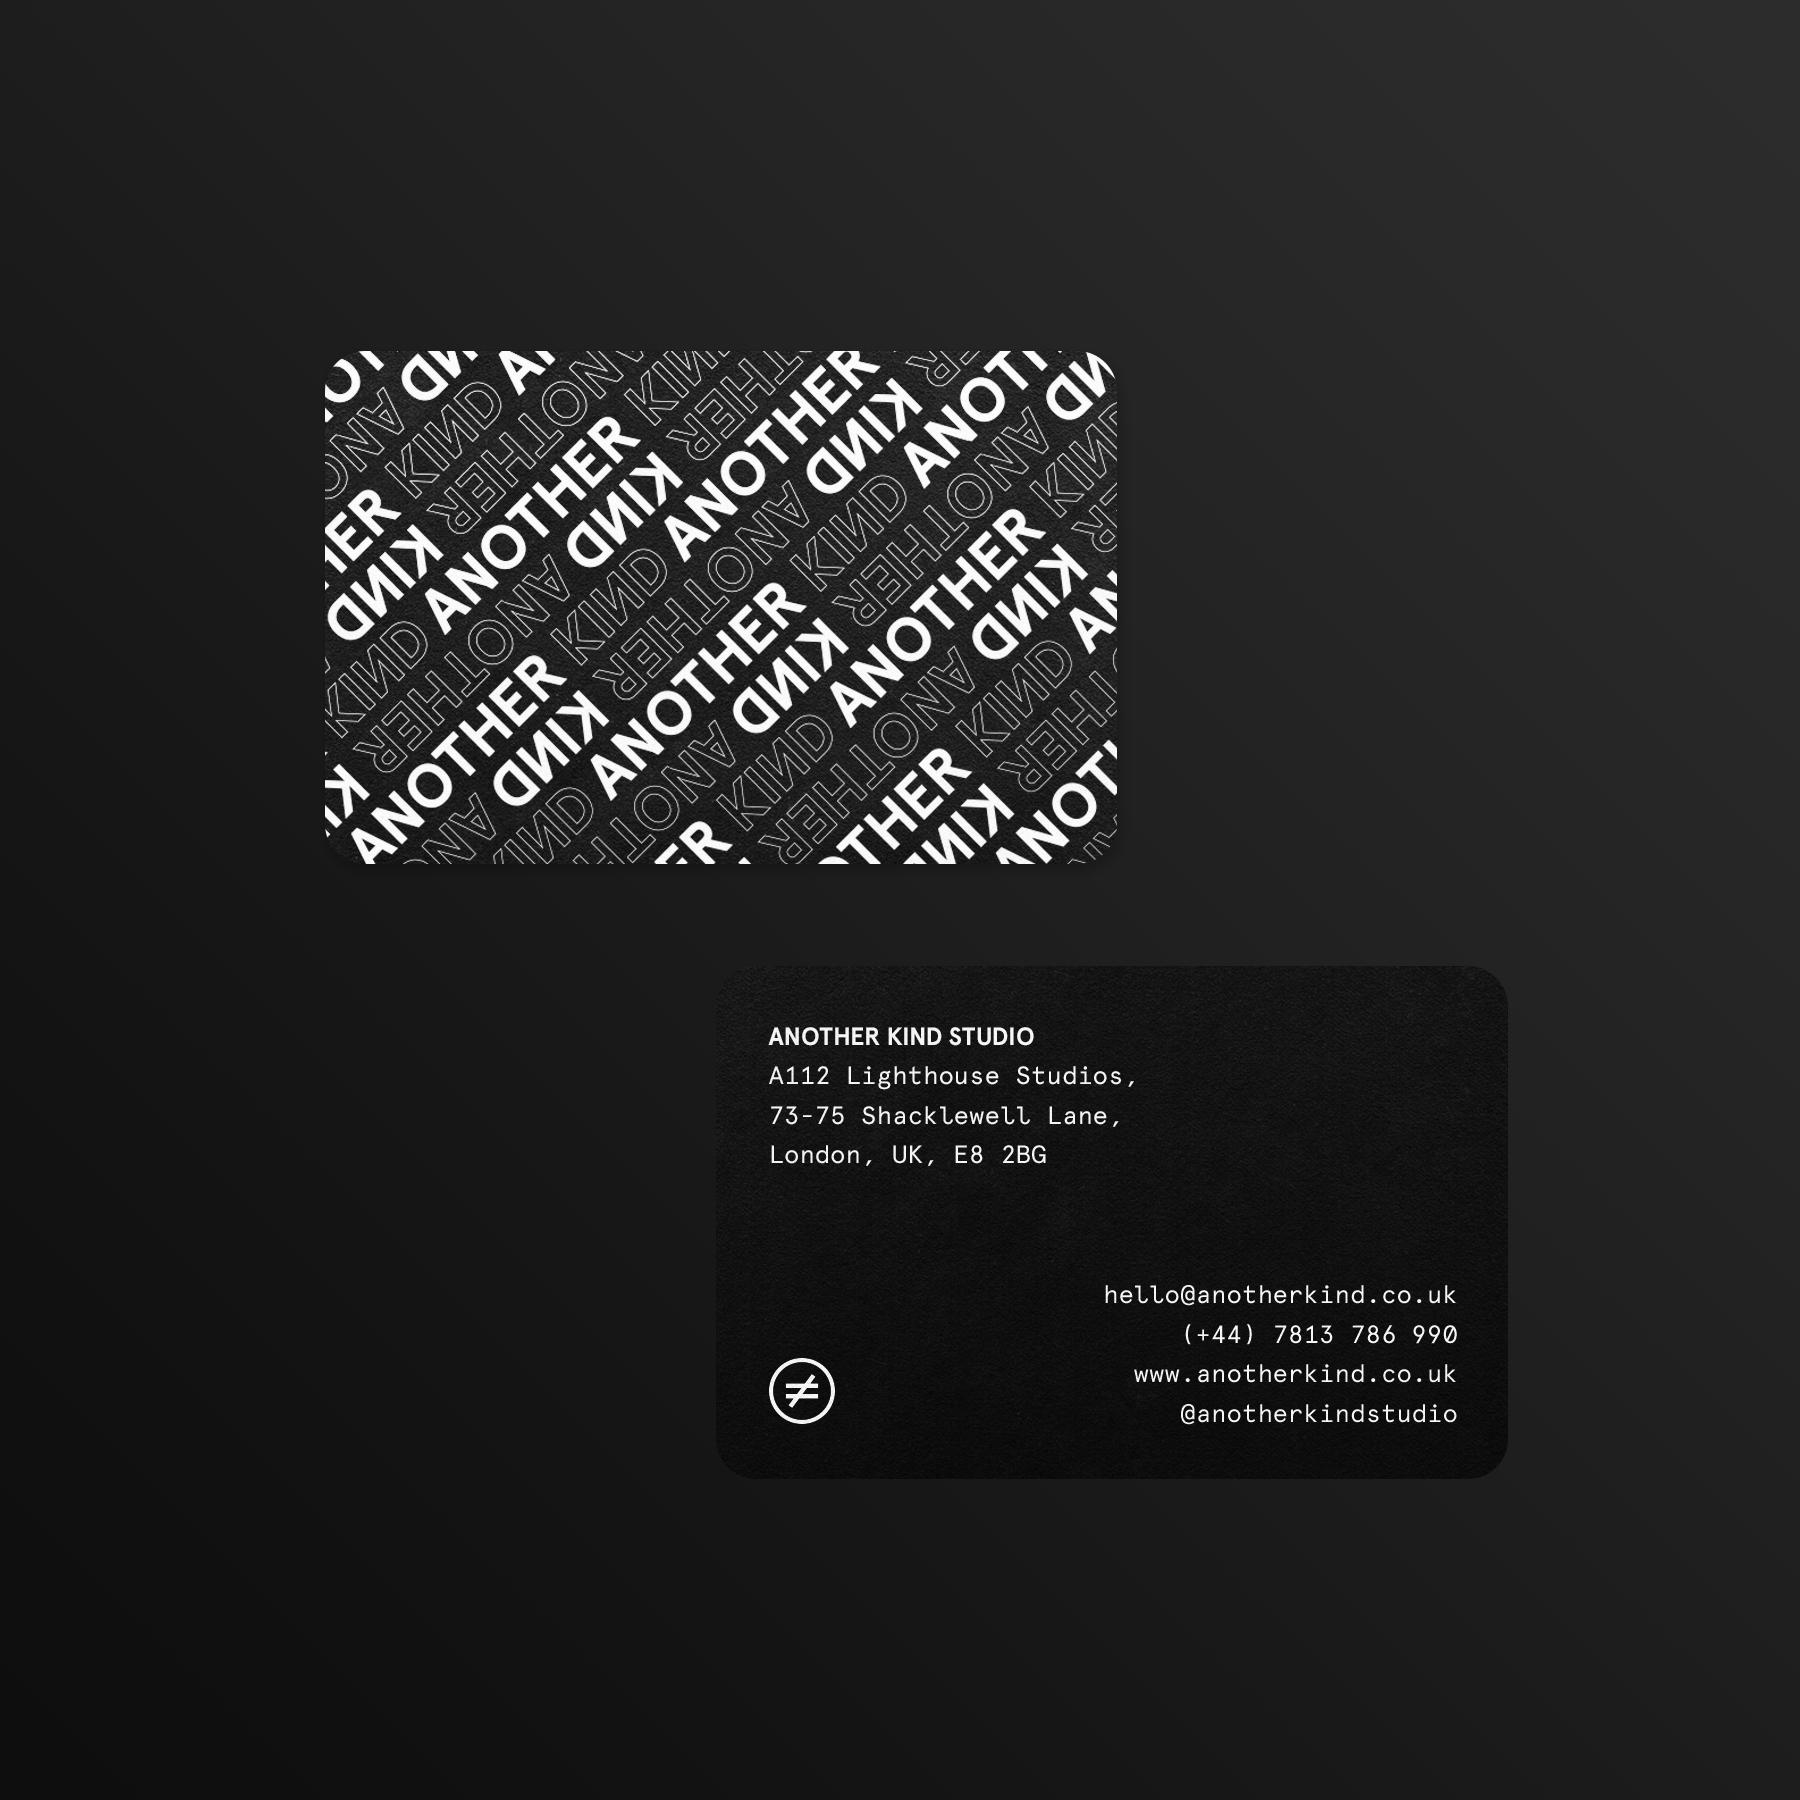 Another Kind Studio Brand Identity